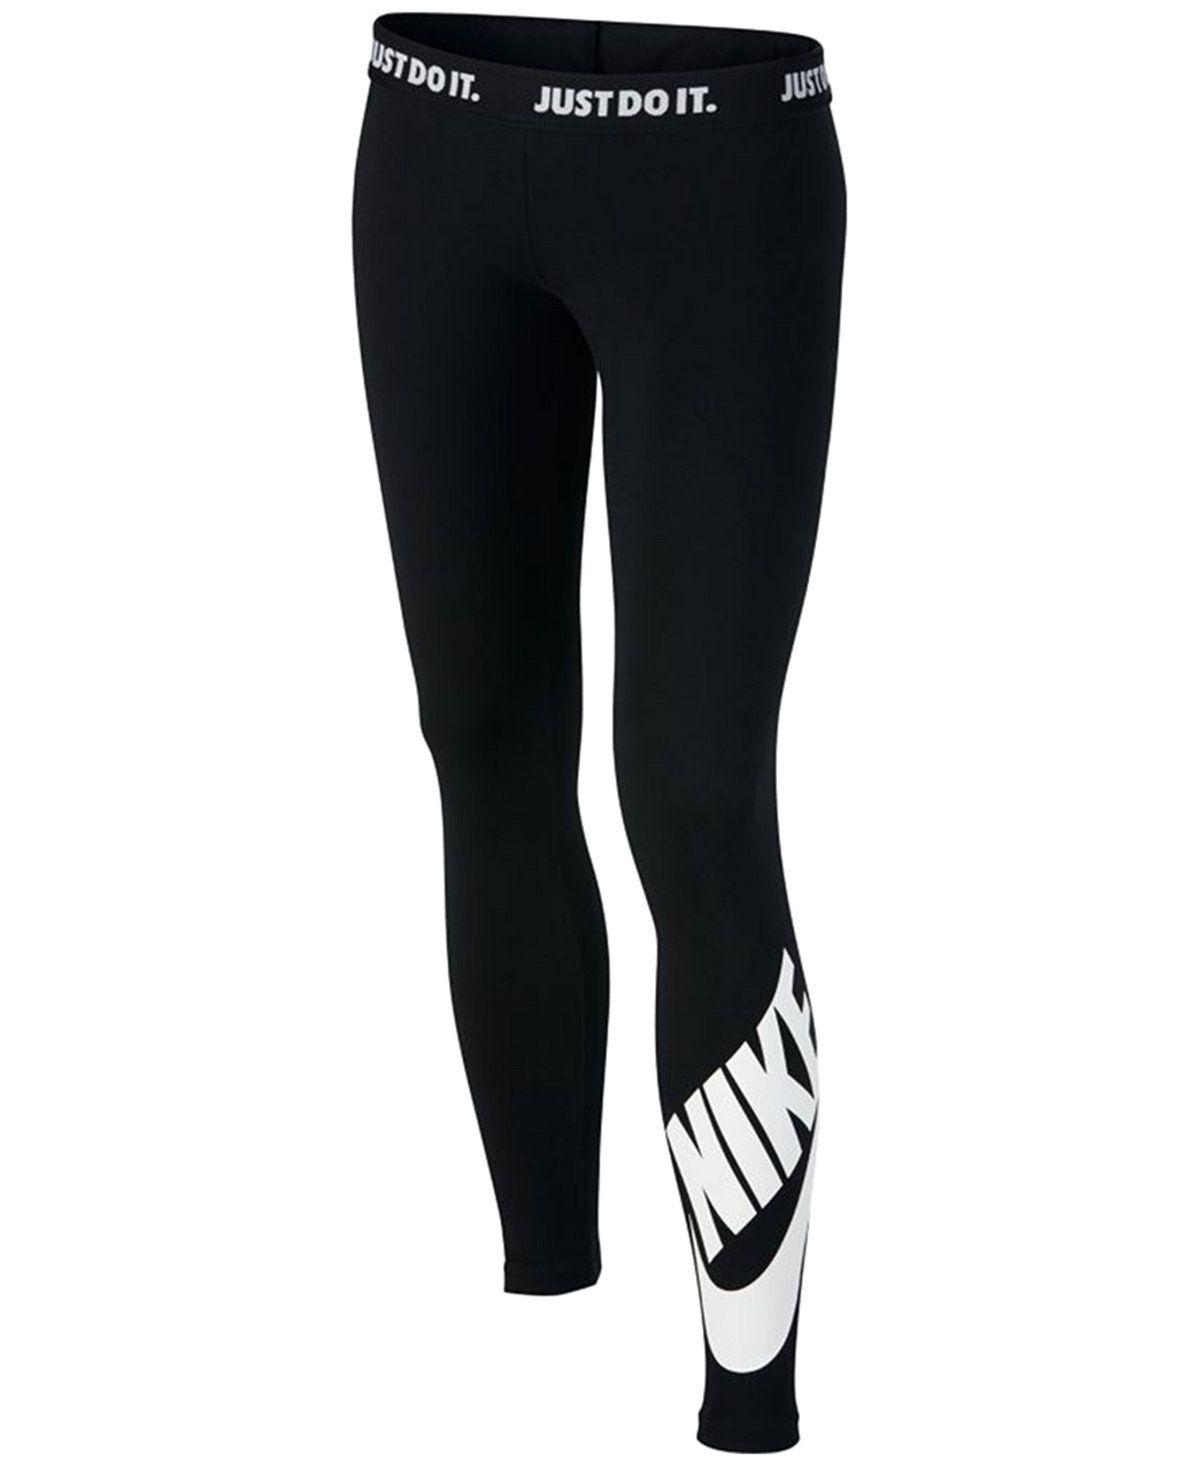 41486d1a68a35e Nike Logo Graphic Leggings, Big Girls (7-16) - Leggings & Pants - Kids &  Baby - Macy's